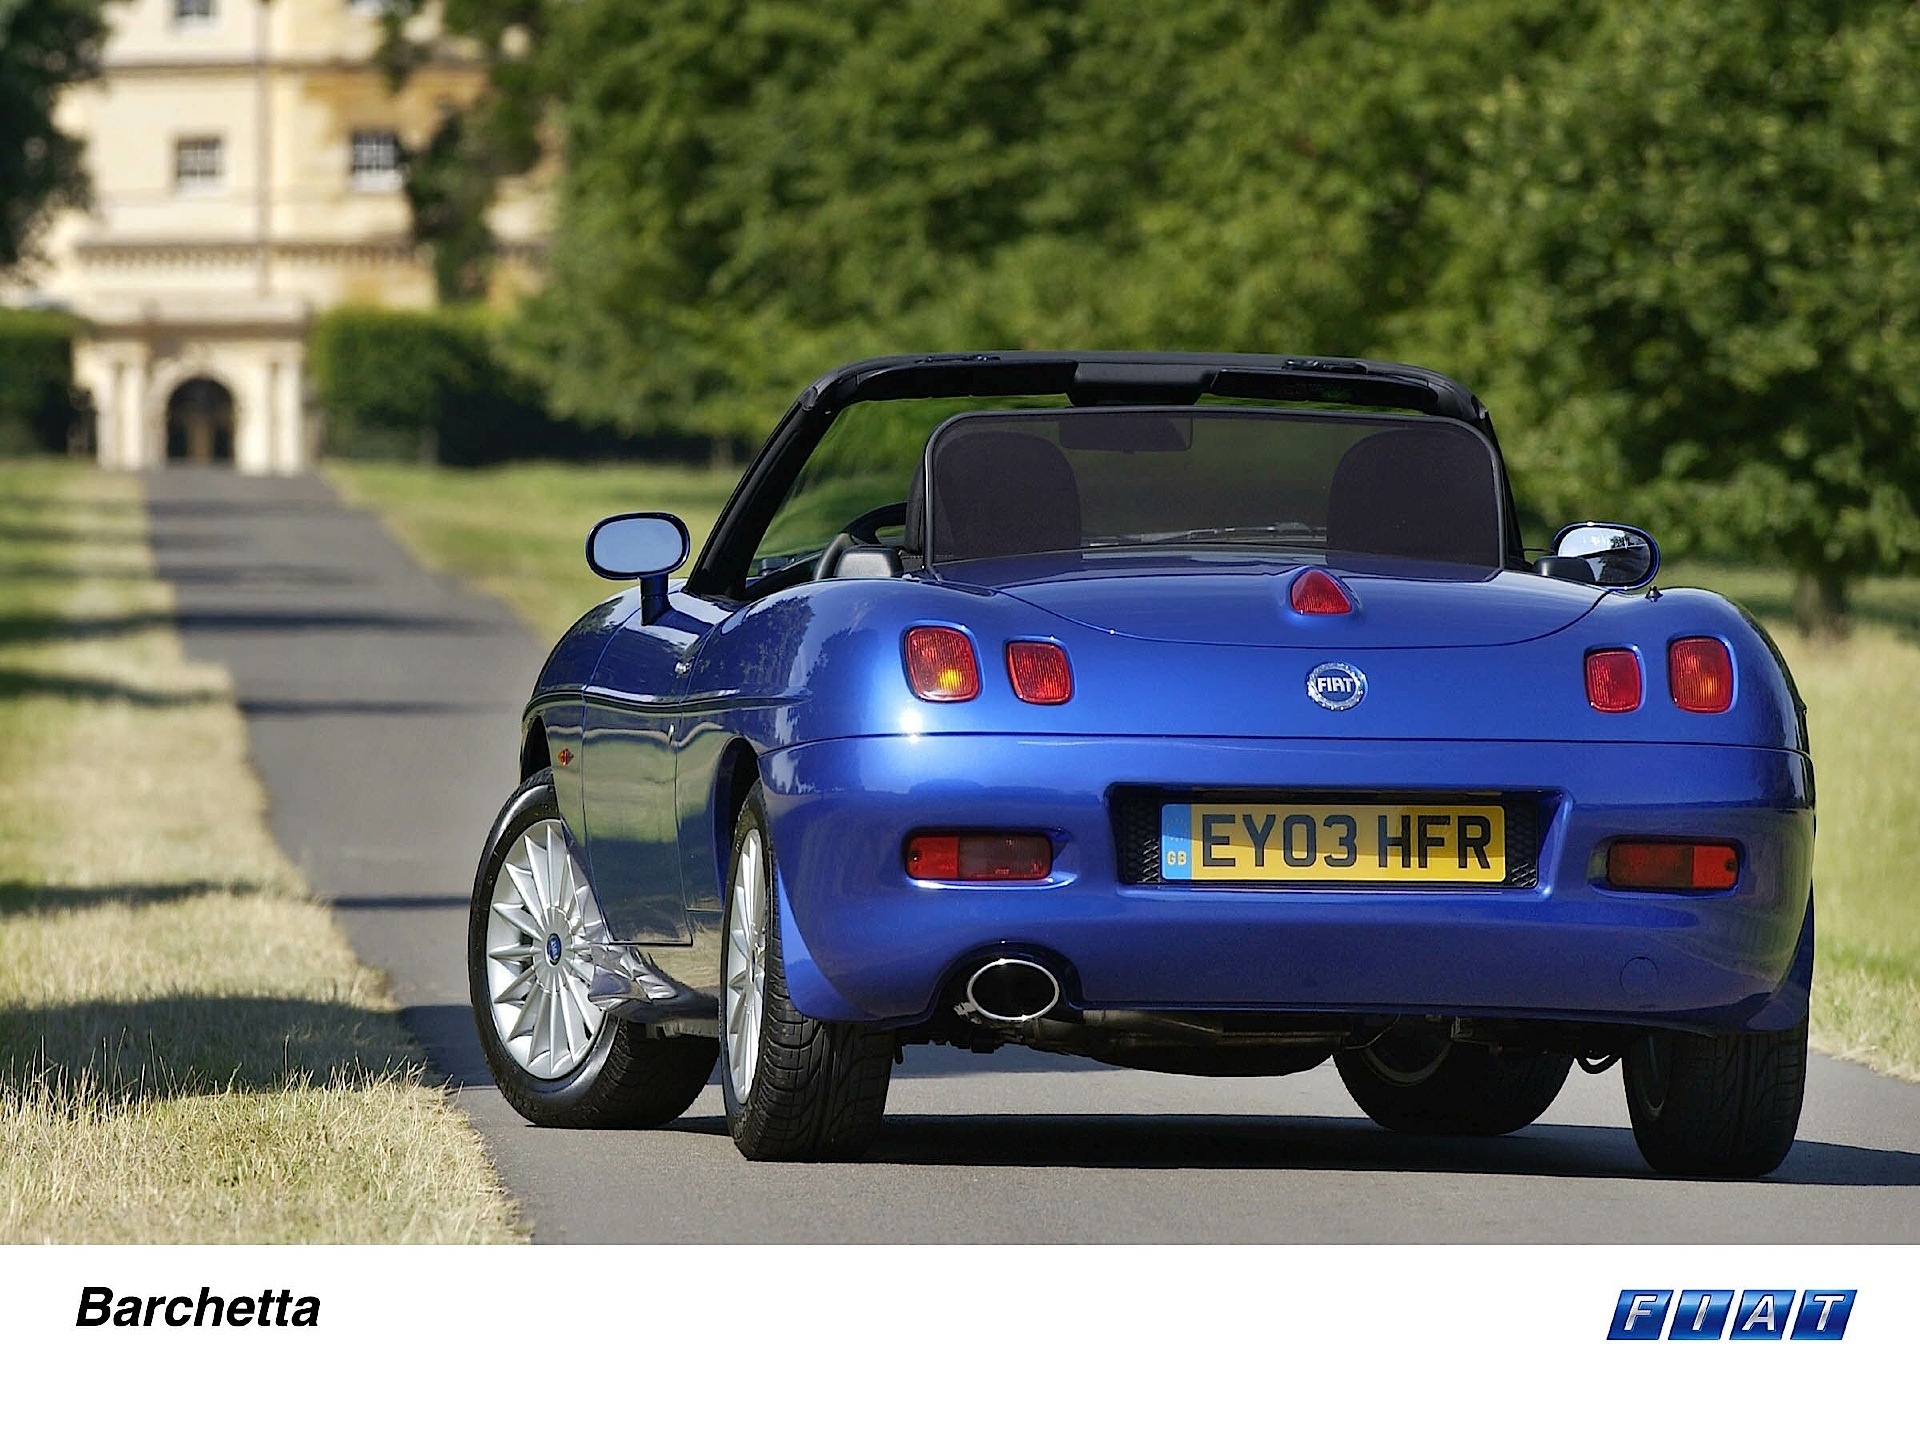 Fiat Barchetta I Restyling 2003 - 2005 Cabriolet #4